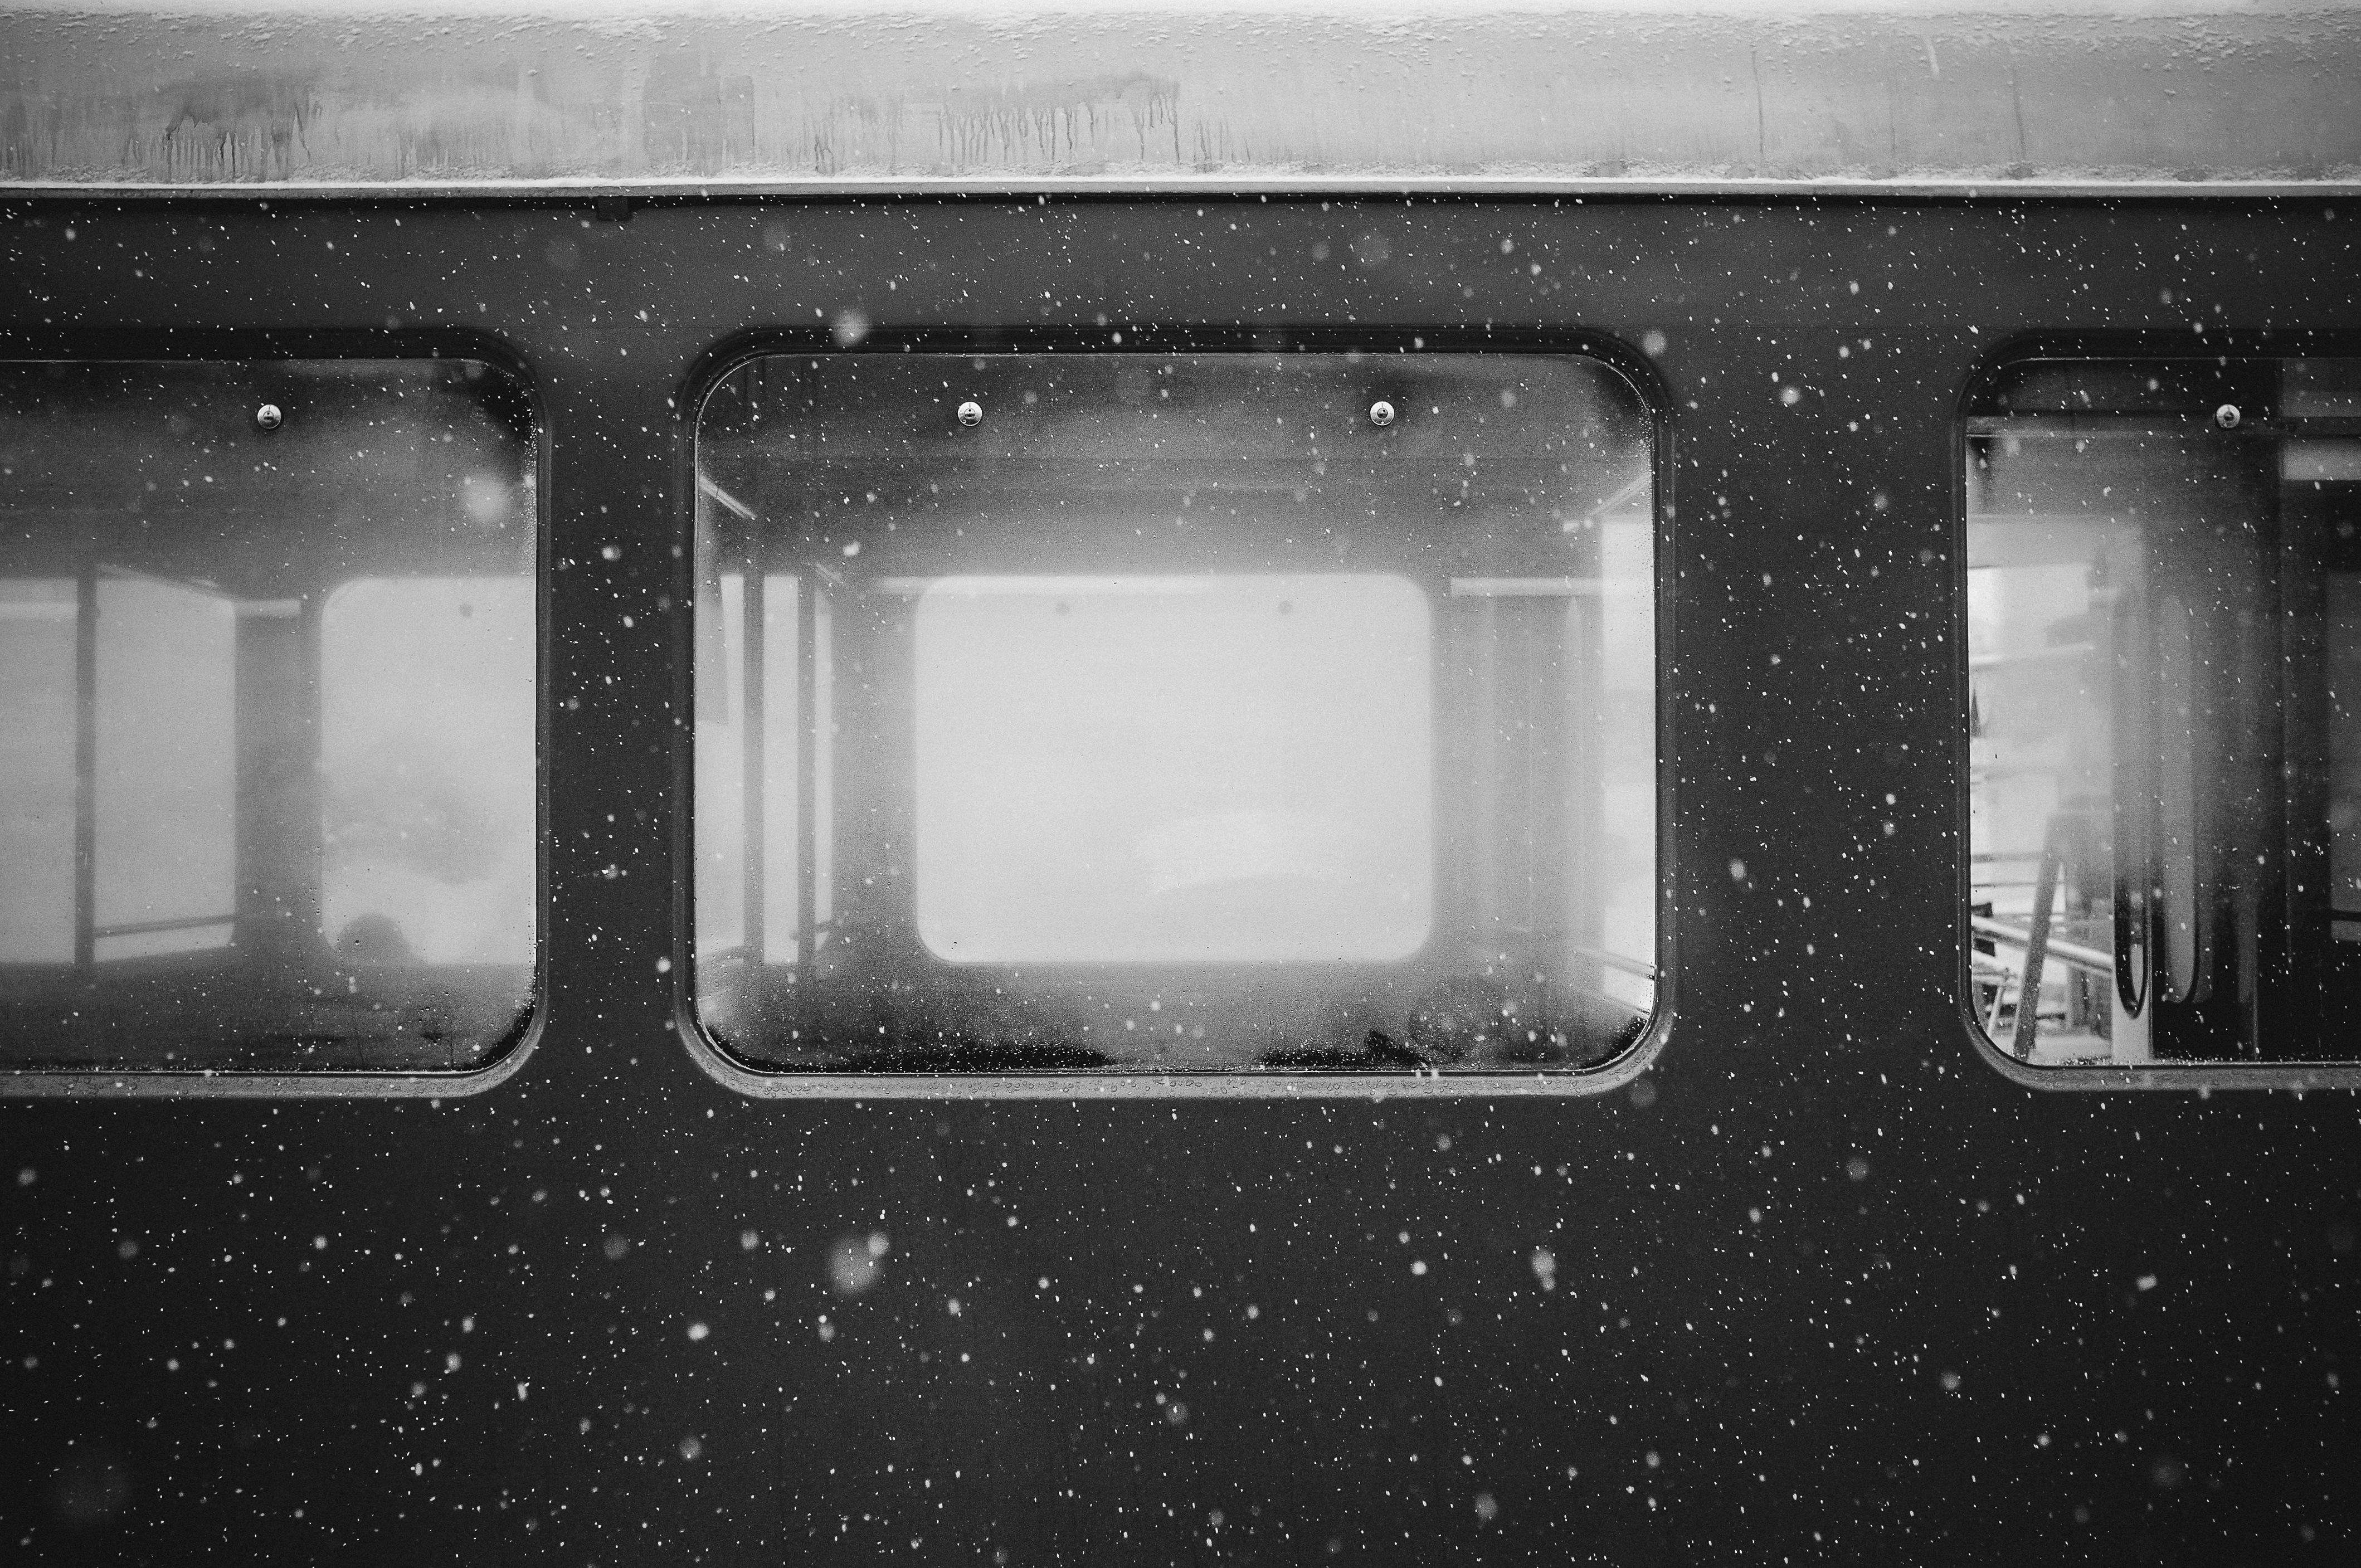 10 treinreizen om in 2015 te maken